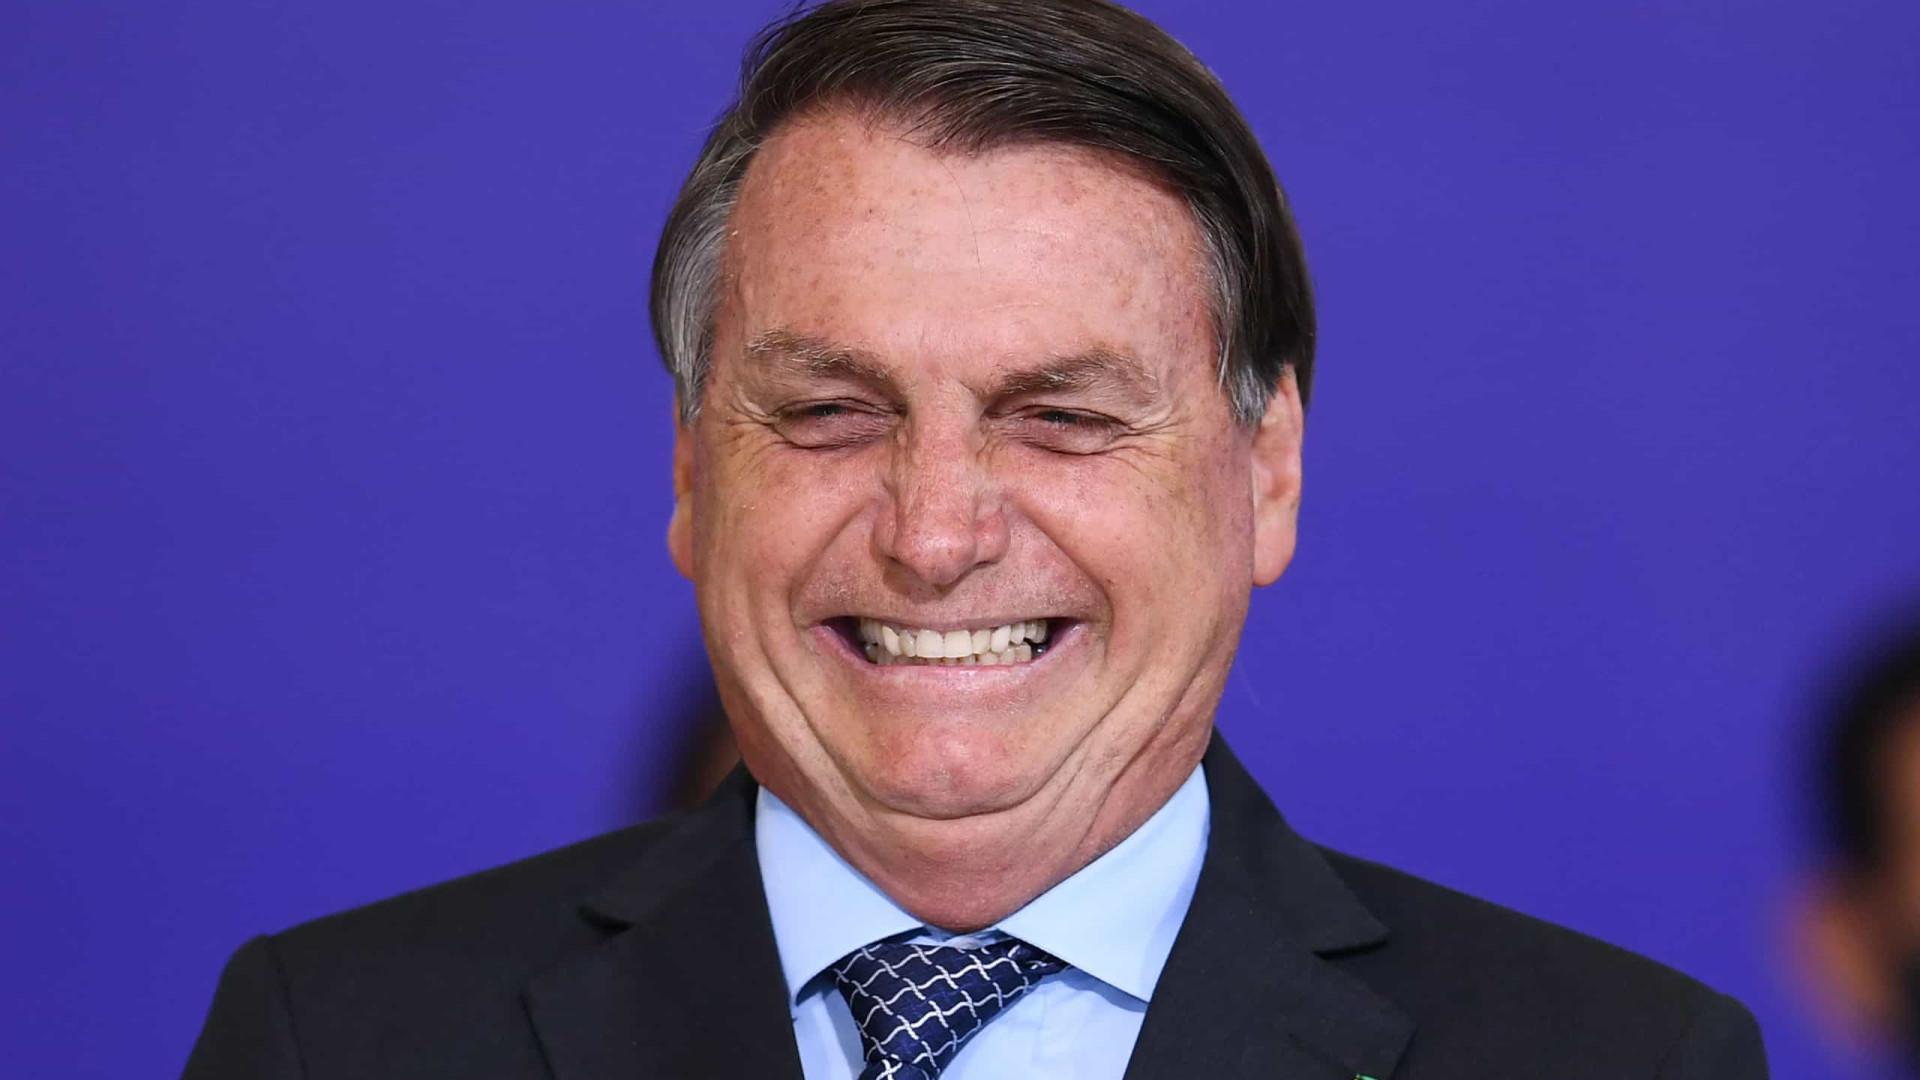 Em dia de recorde de mortes por Covid-19 no Brasil, Bolsonaro fala contra uso de máscaras